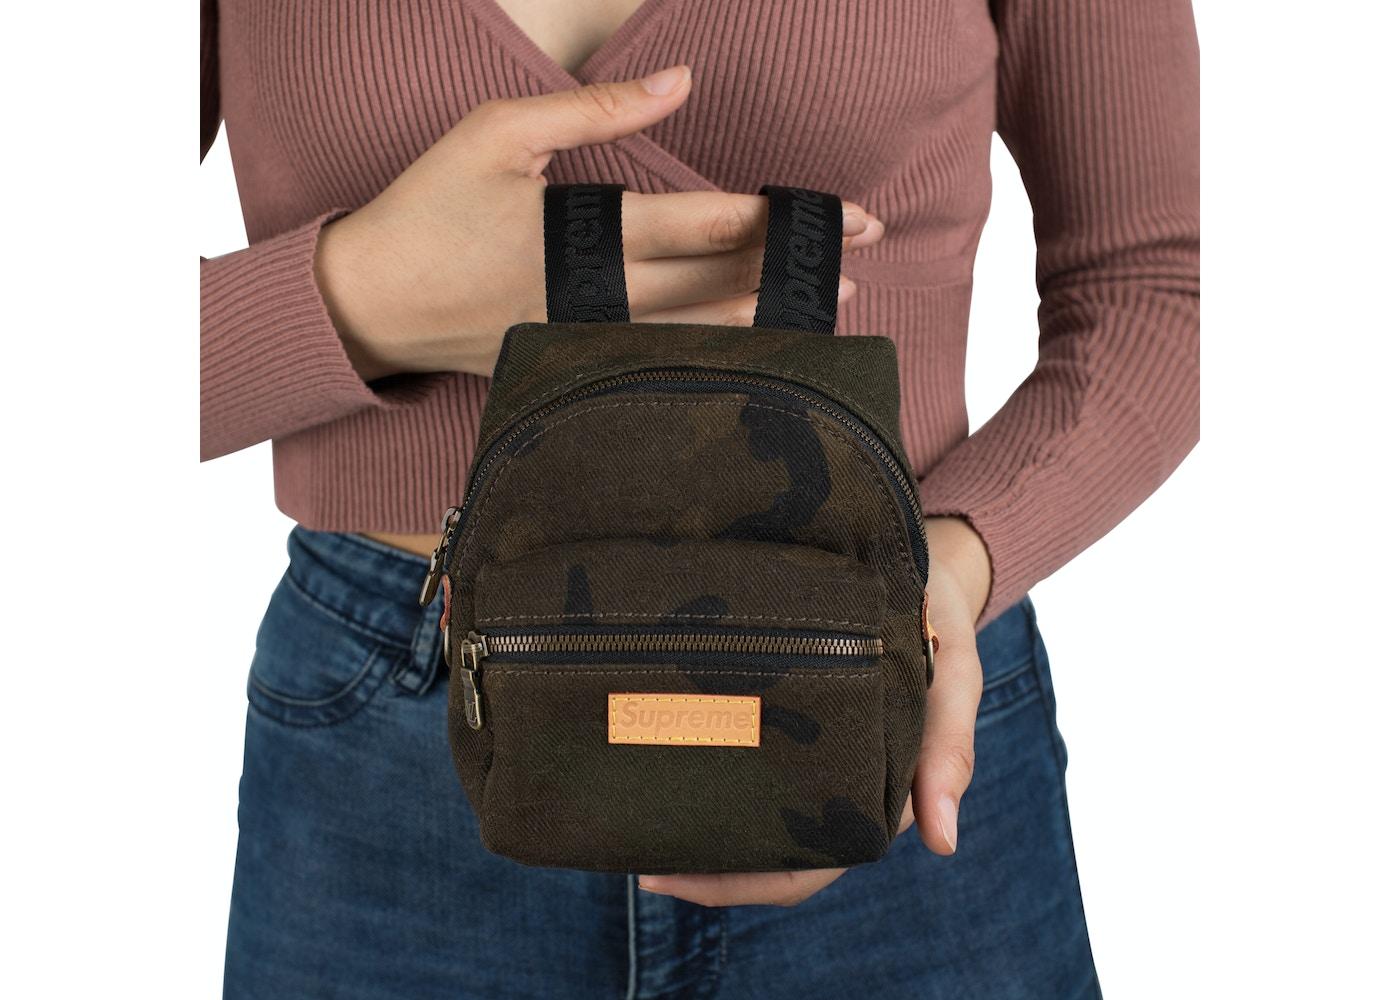 1219300be1c Buy   Sell Louis Vuitton Supreme Handbags - Volatility